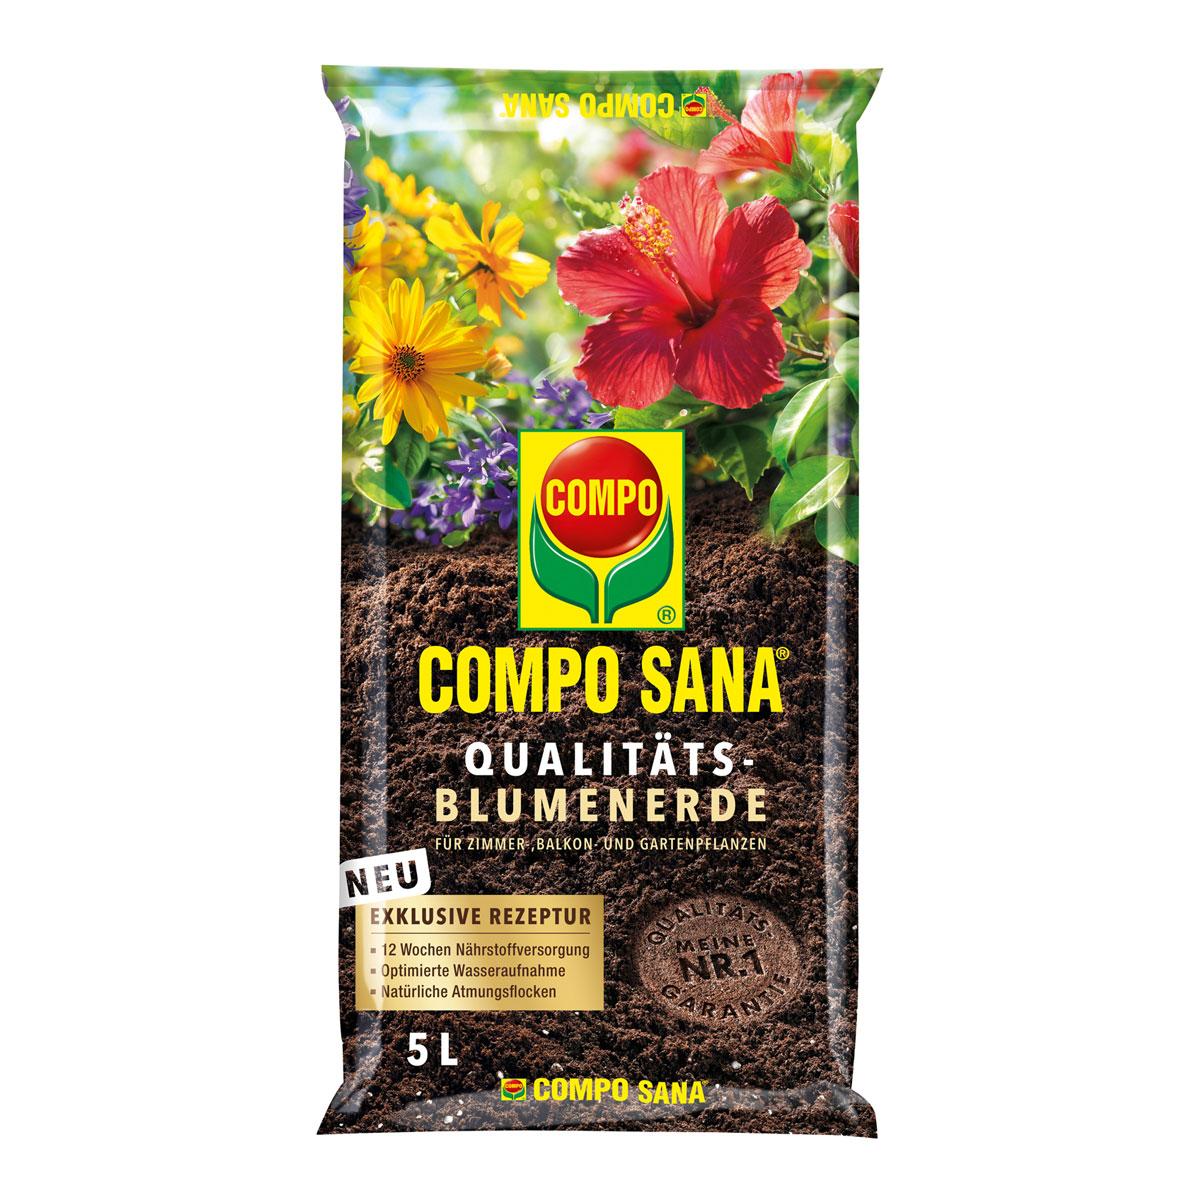 Compo SANA® Qualitäts-Blumenerde 5 L 5 L